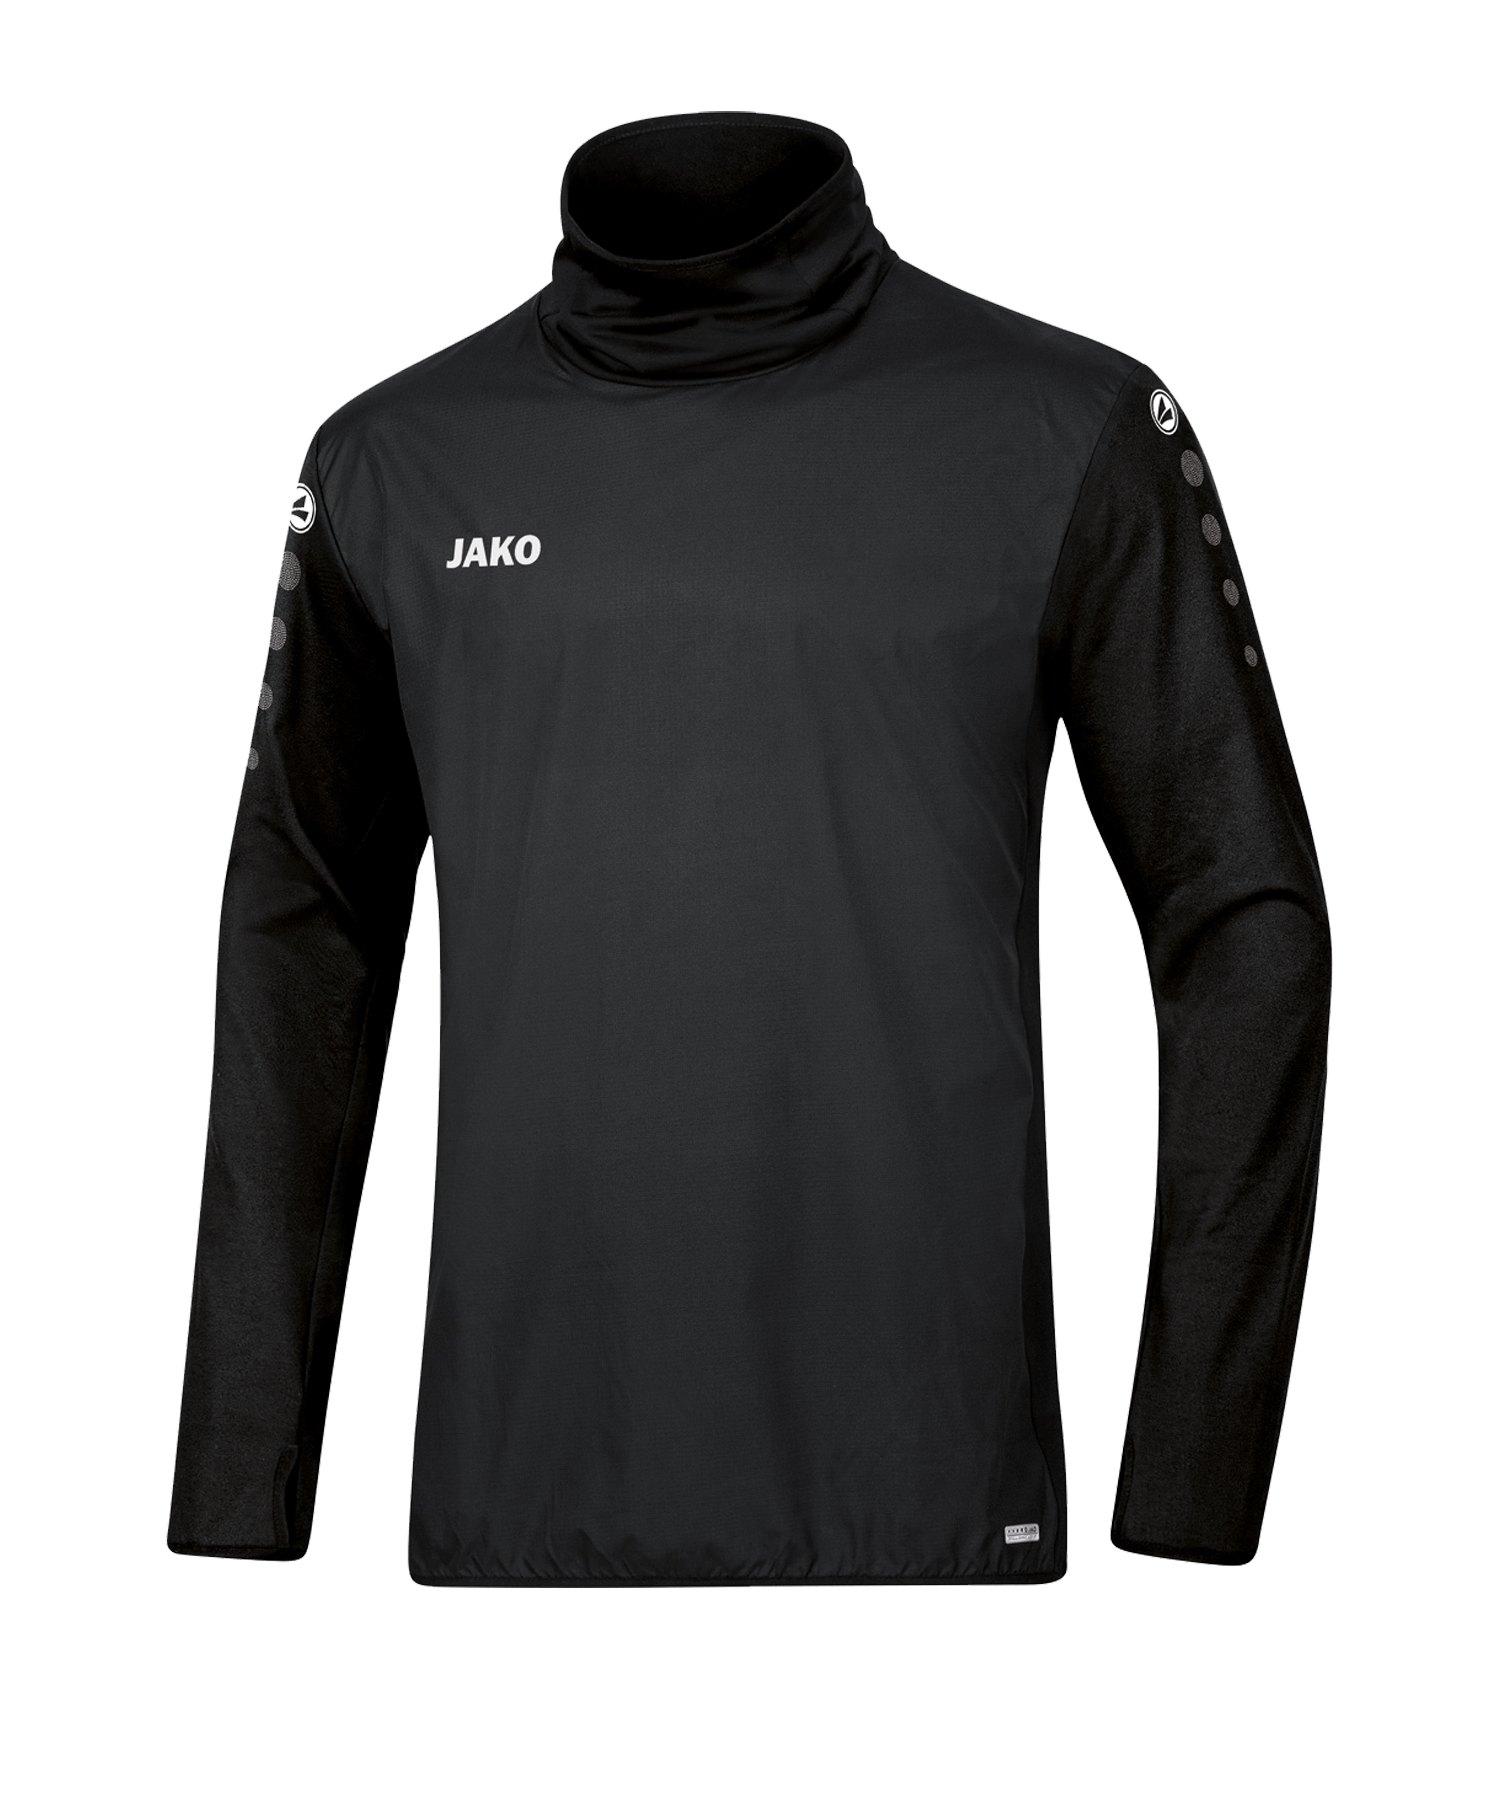 JAKO Trainingstop Winter Schwarz F08 - schwarz